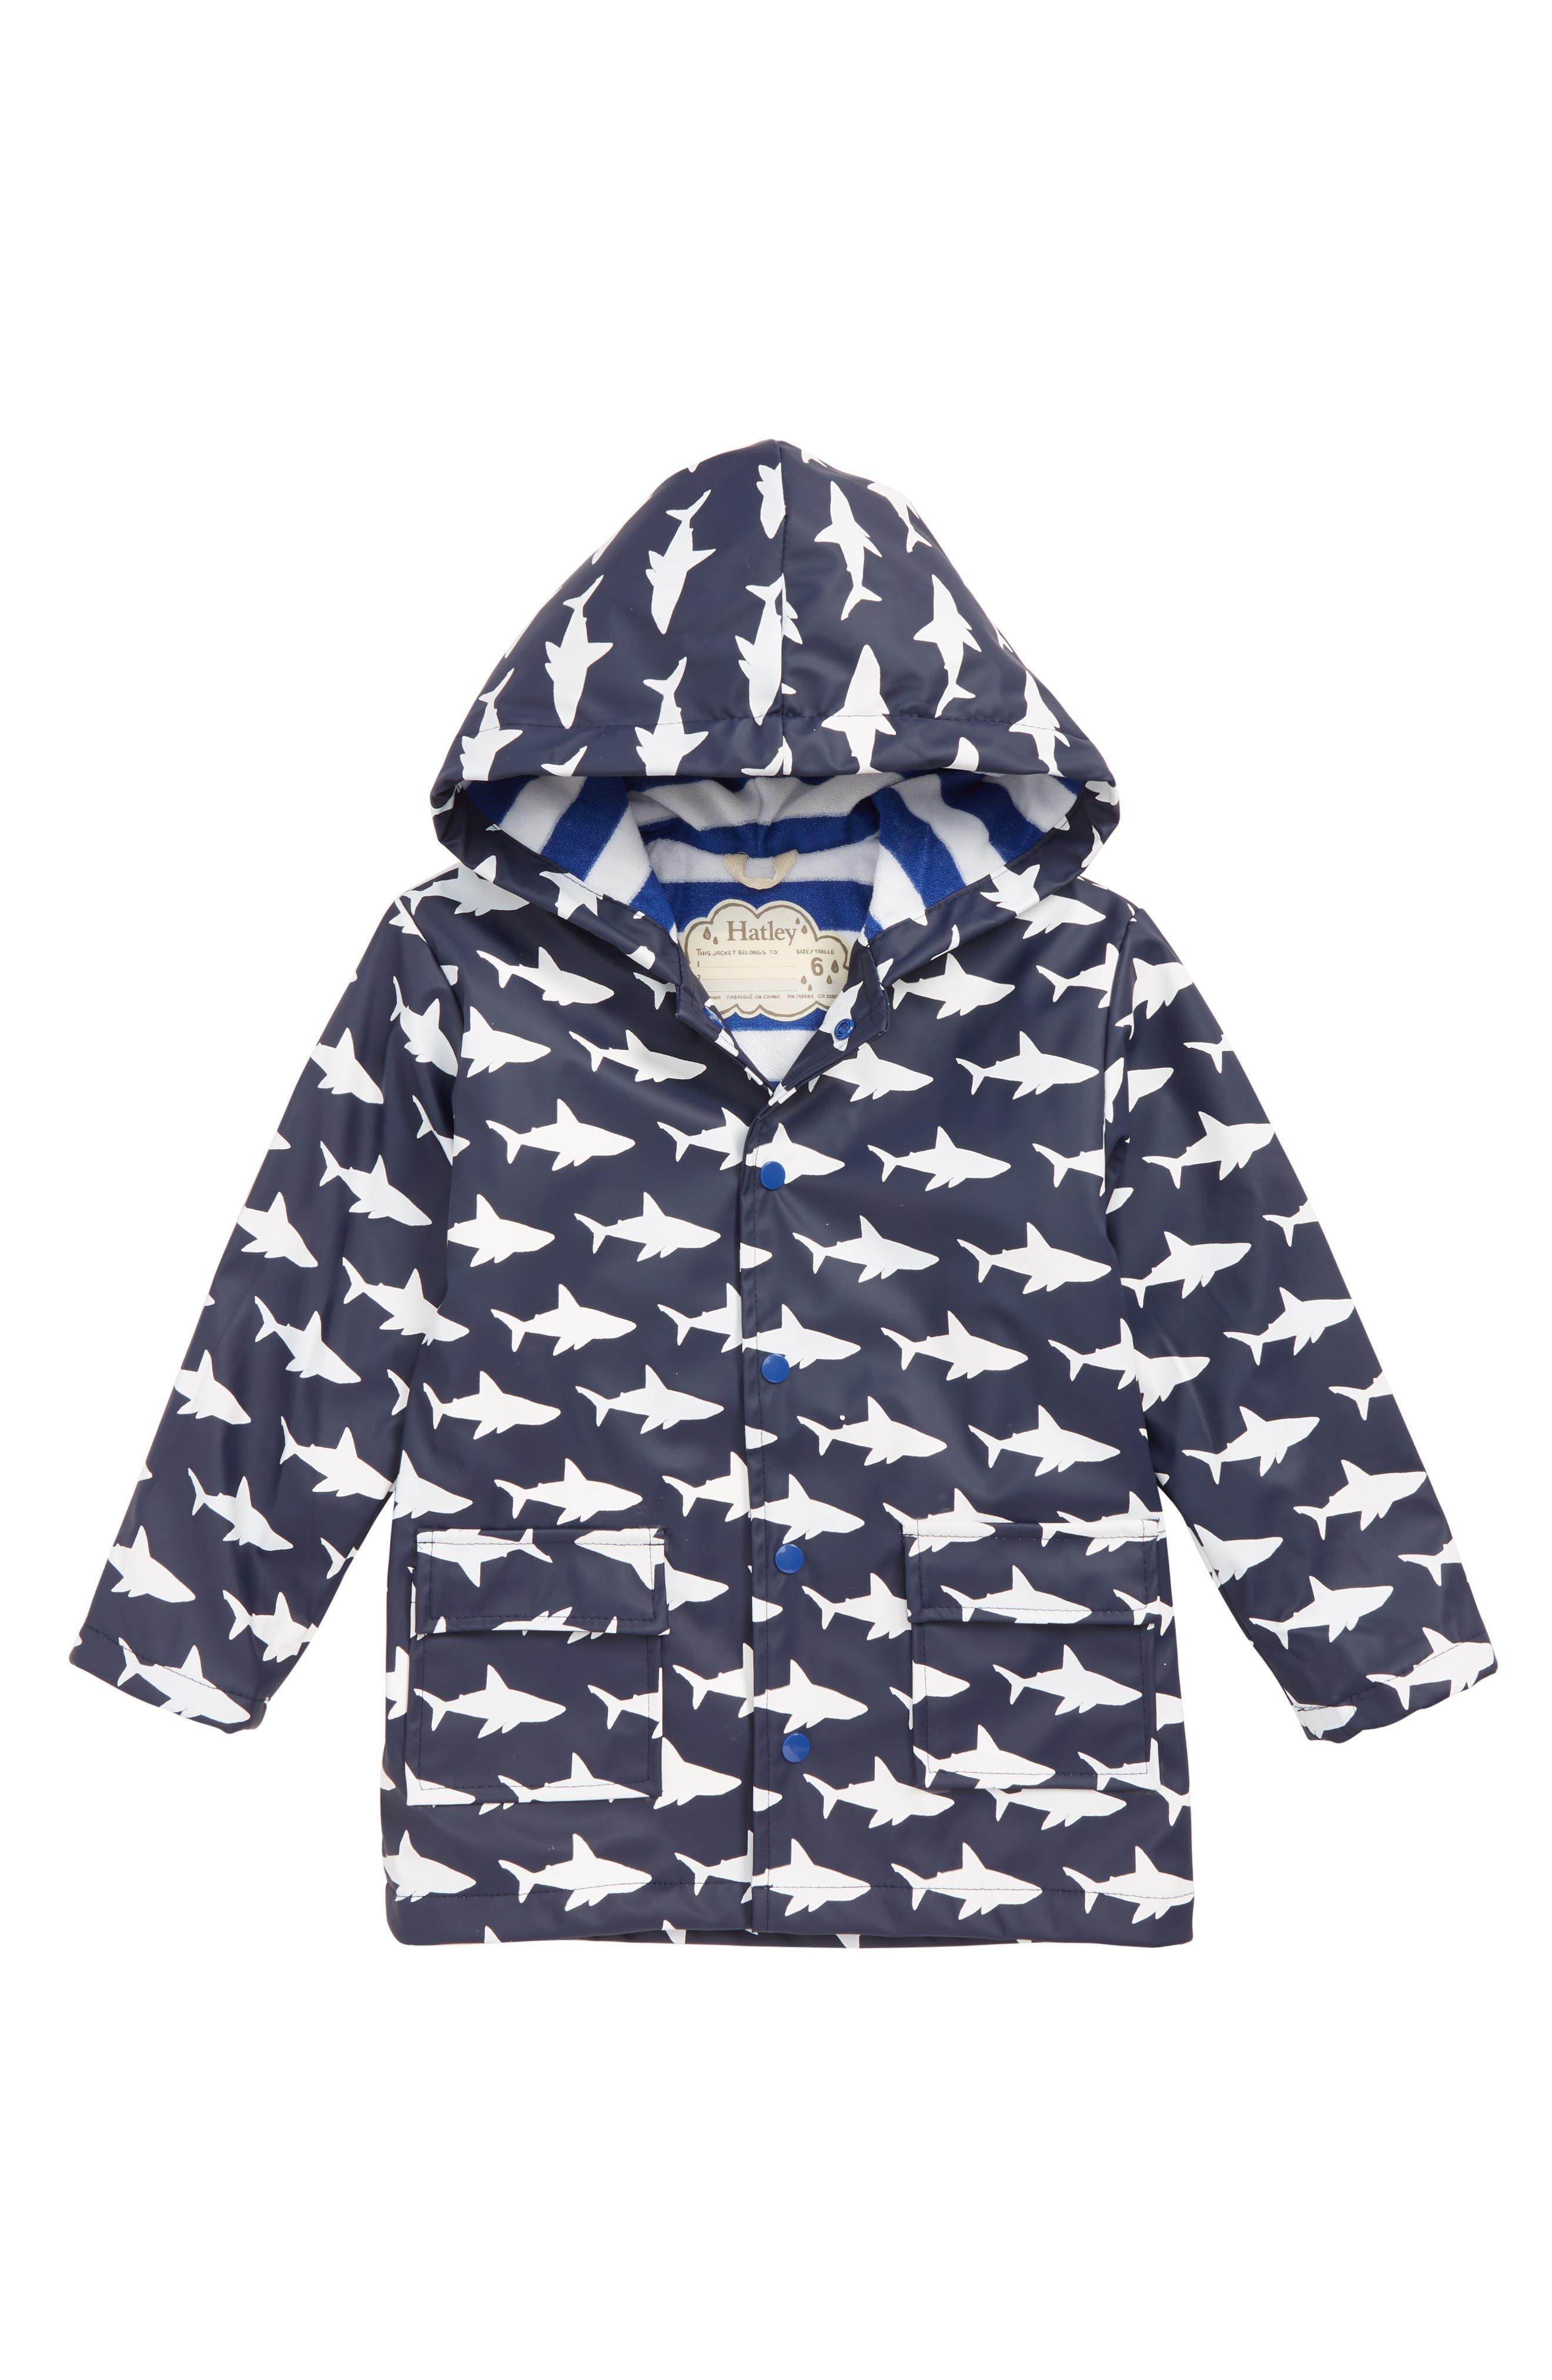 HATLEY Color Changing Sharks Water Resistant Raincoat, Main, color, BLUE